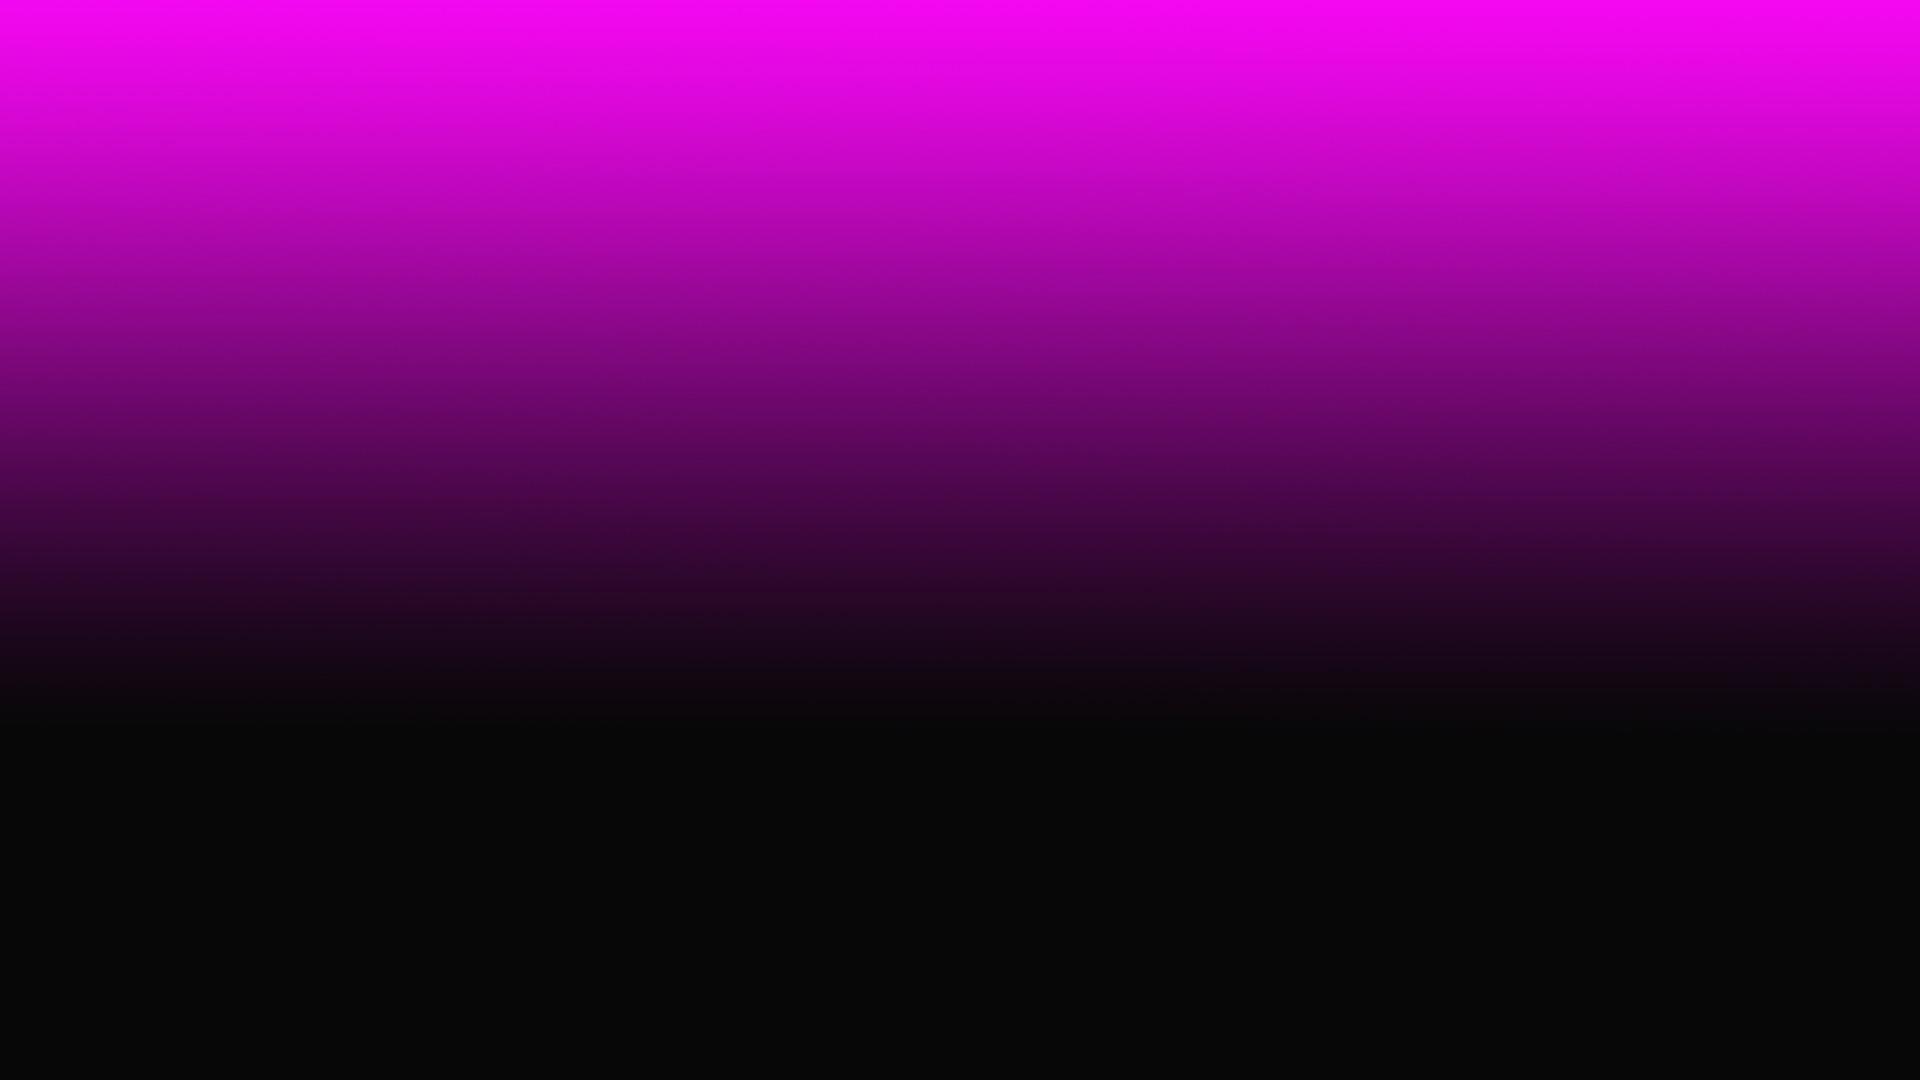 Pink and Black Gradient Wallpaper 58836